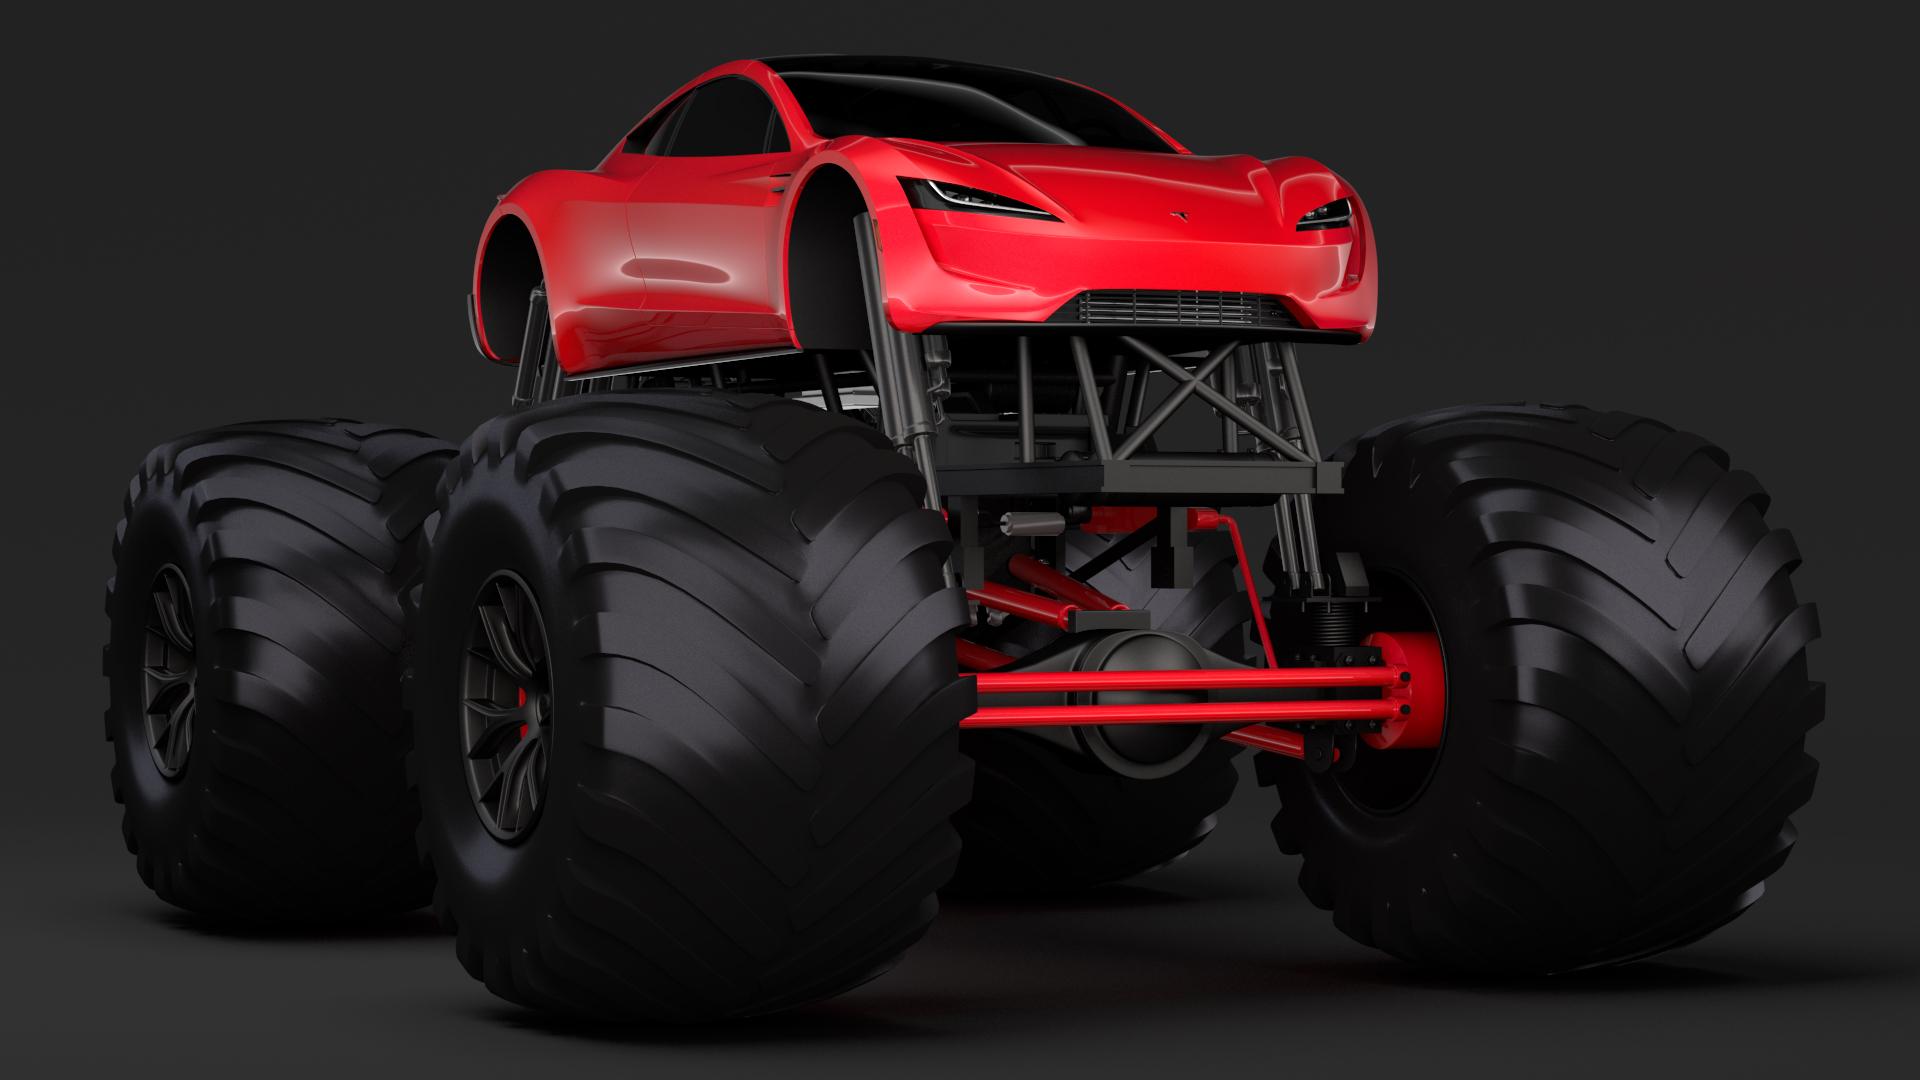 Monster Truck Tesla Roadster By Creator 3d 3docean